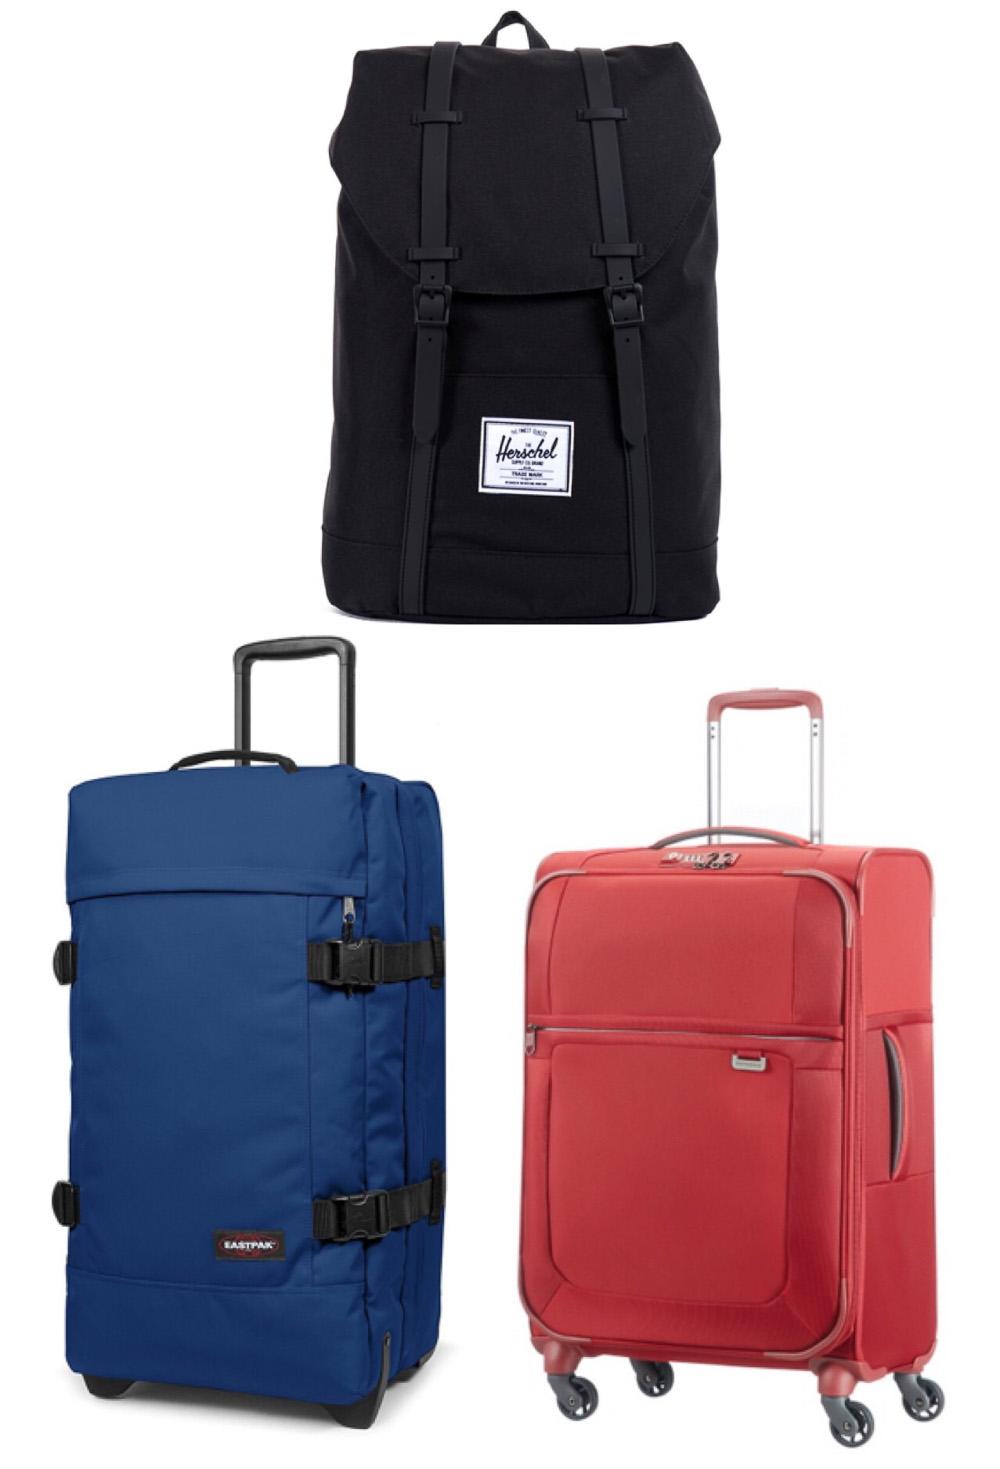 tutorial-como-hacer-maleta-viaje-IMG_8491